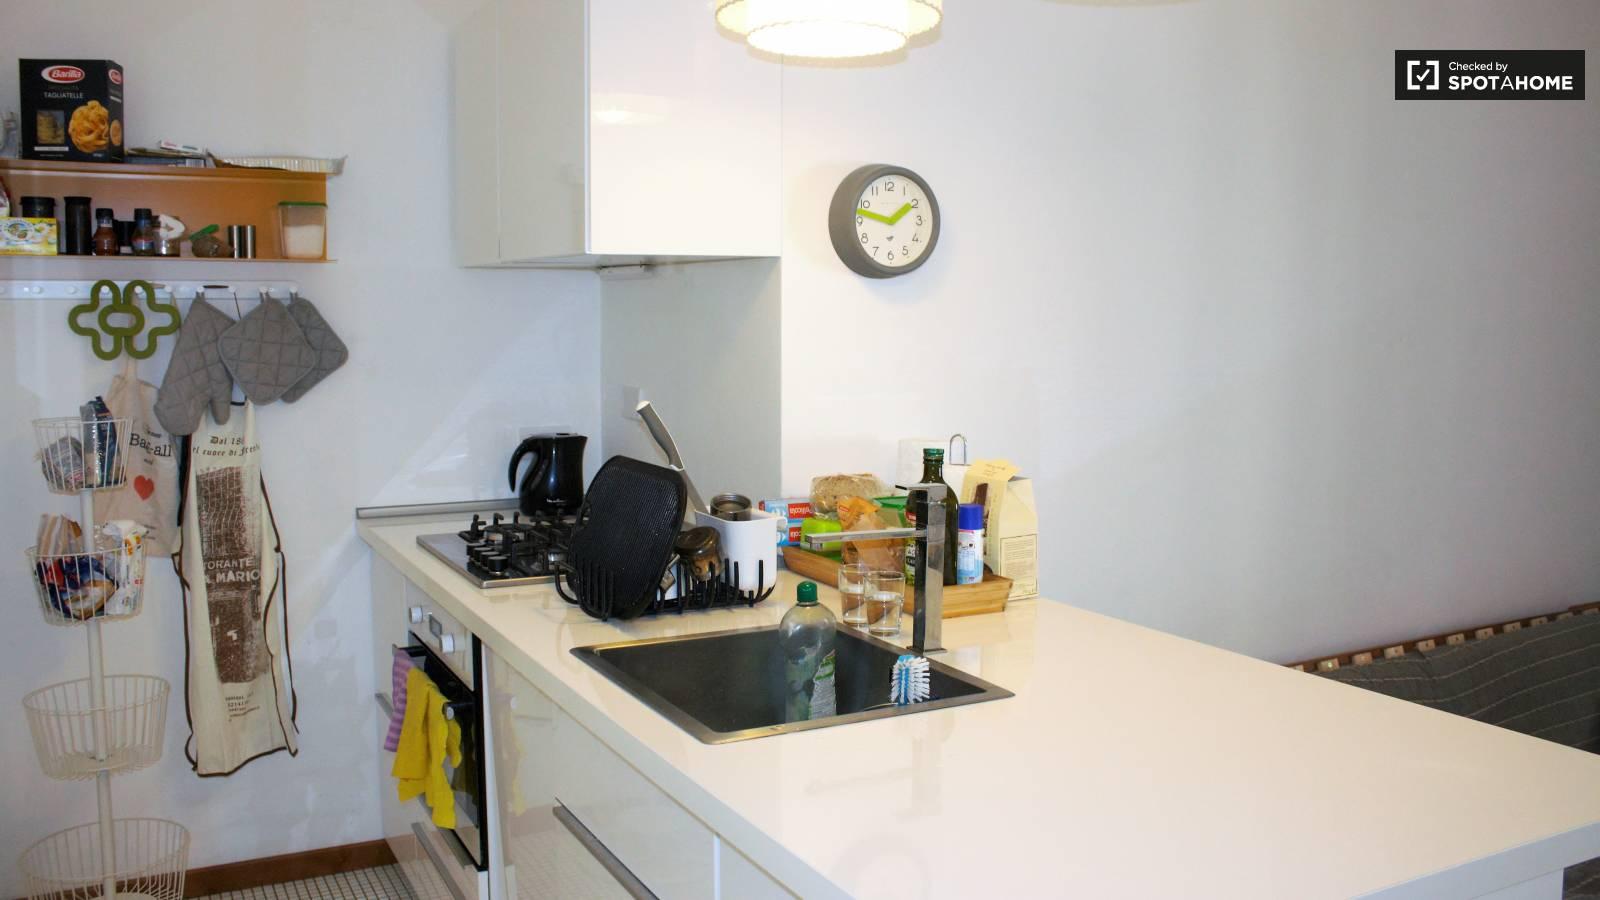 Kitchen - Open space